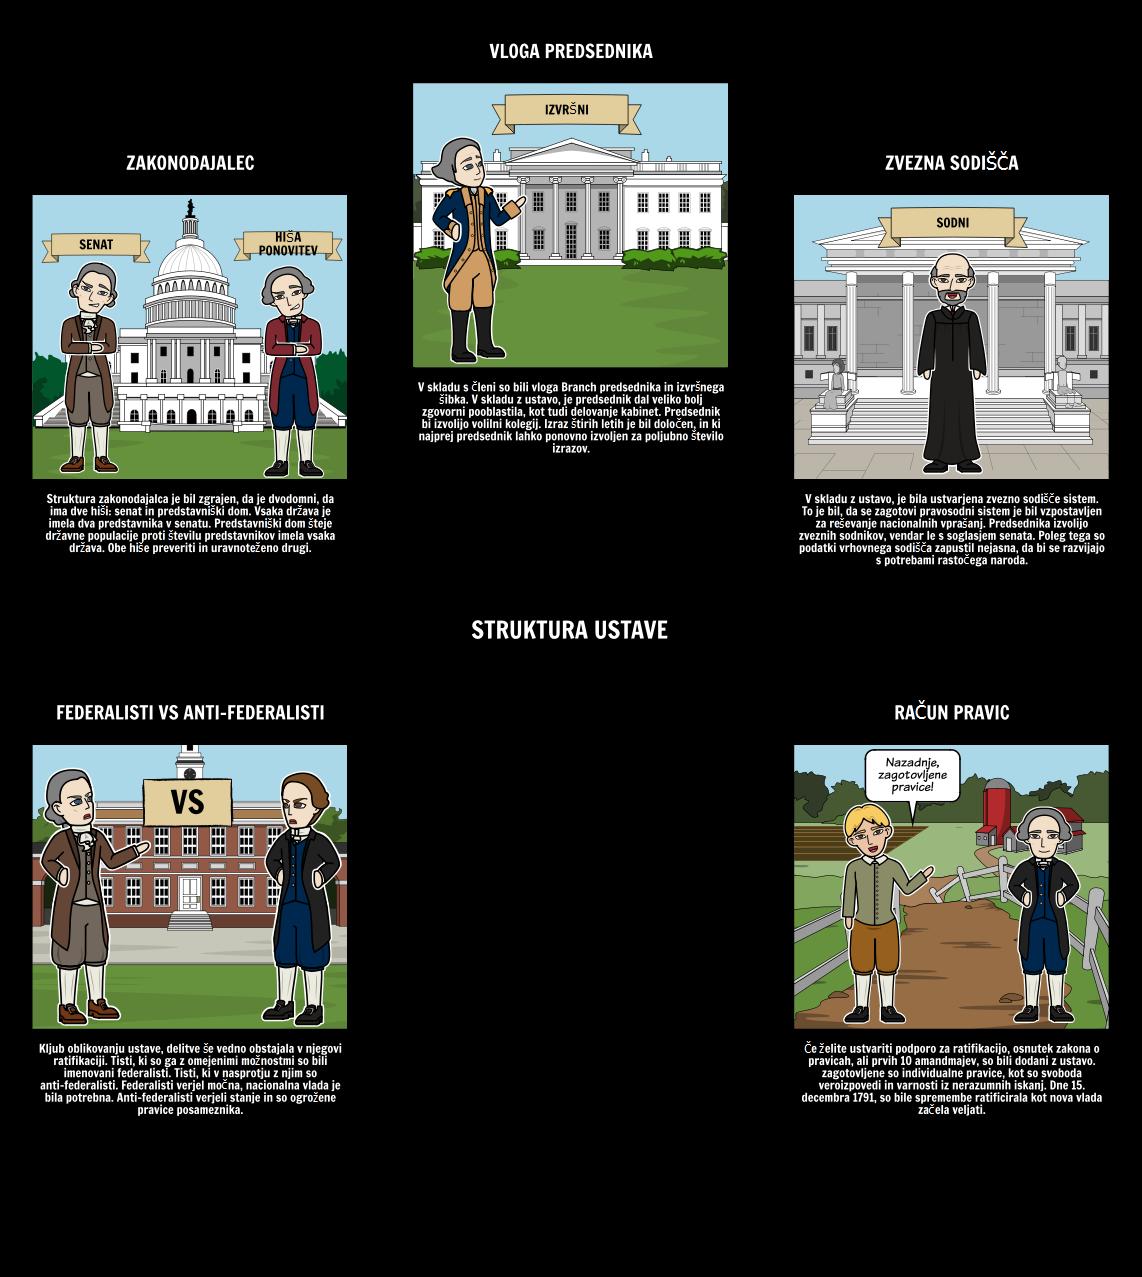 Federalizem - Struktura Ustave